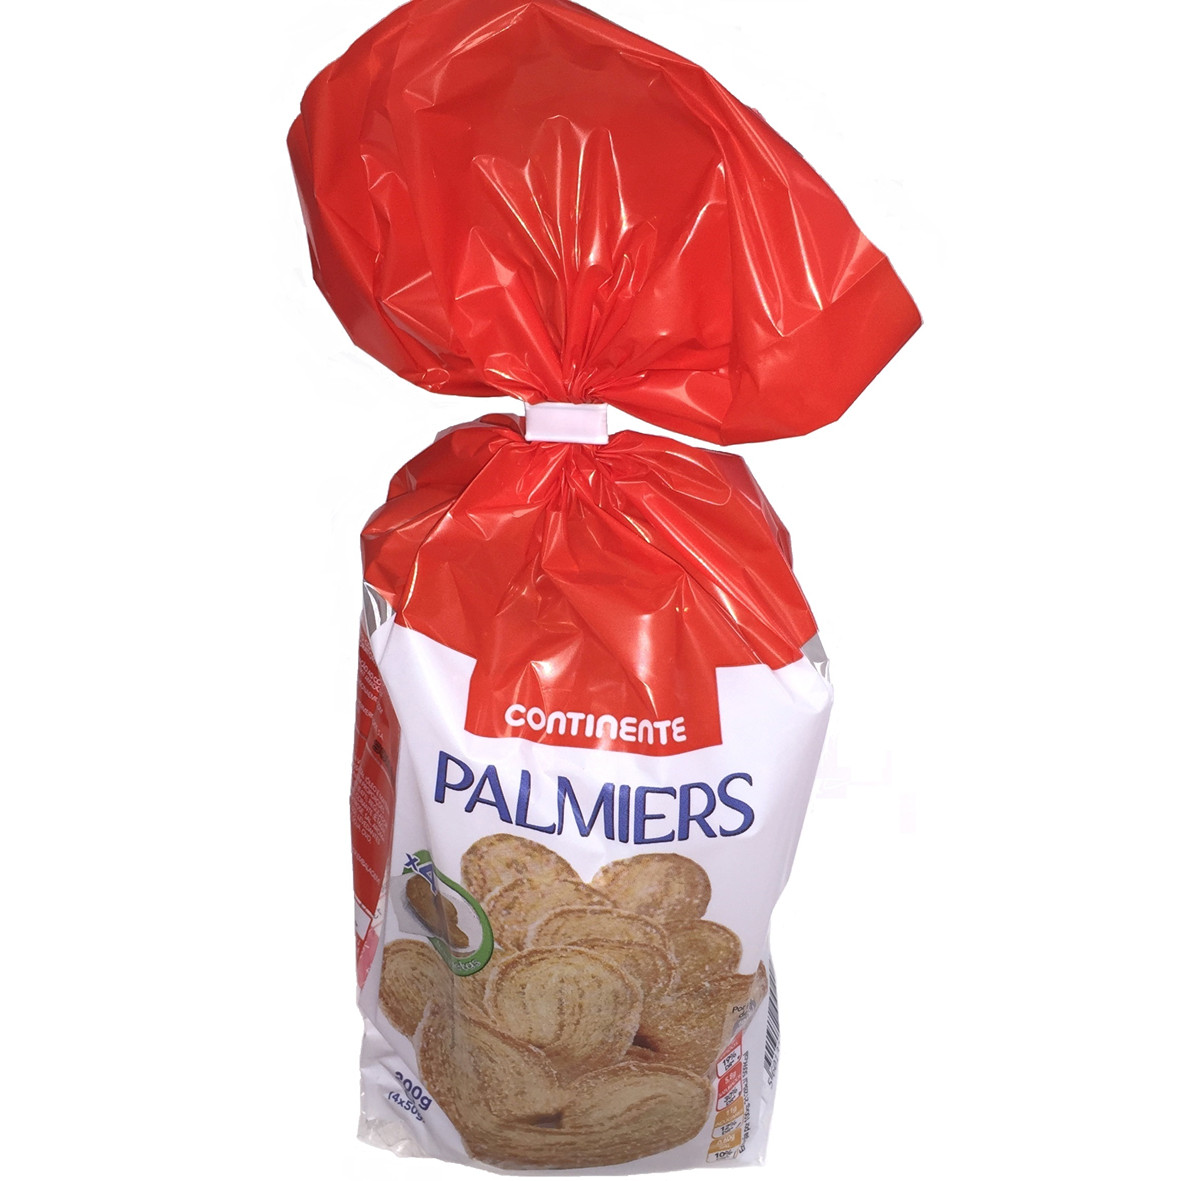 Palmiers - Continente